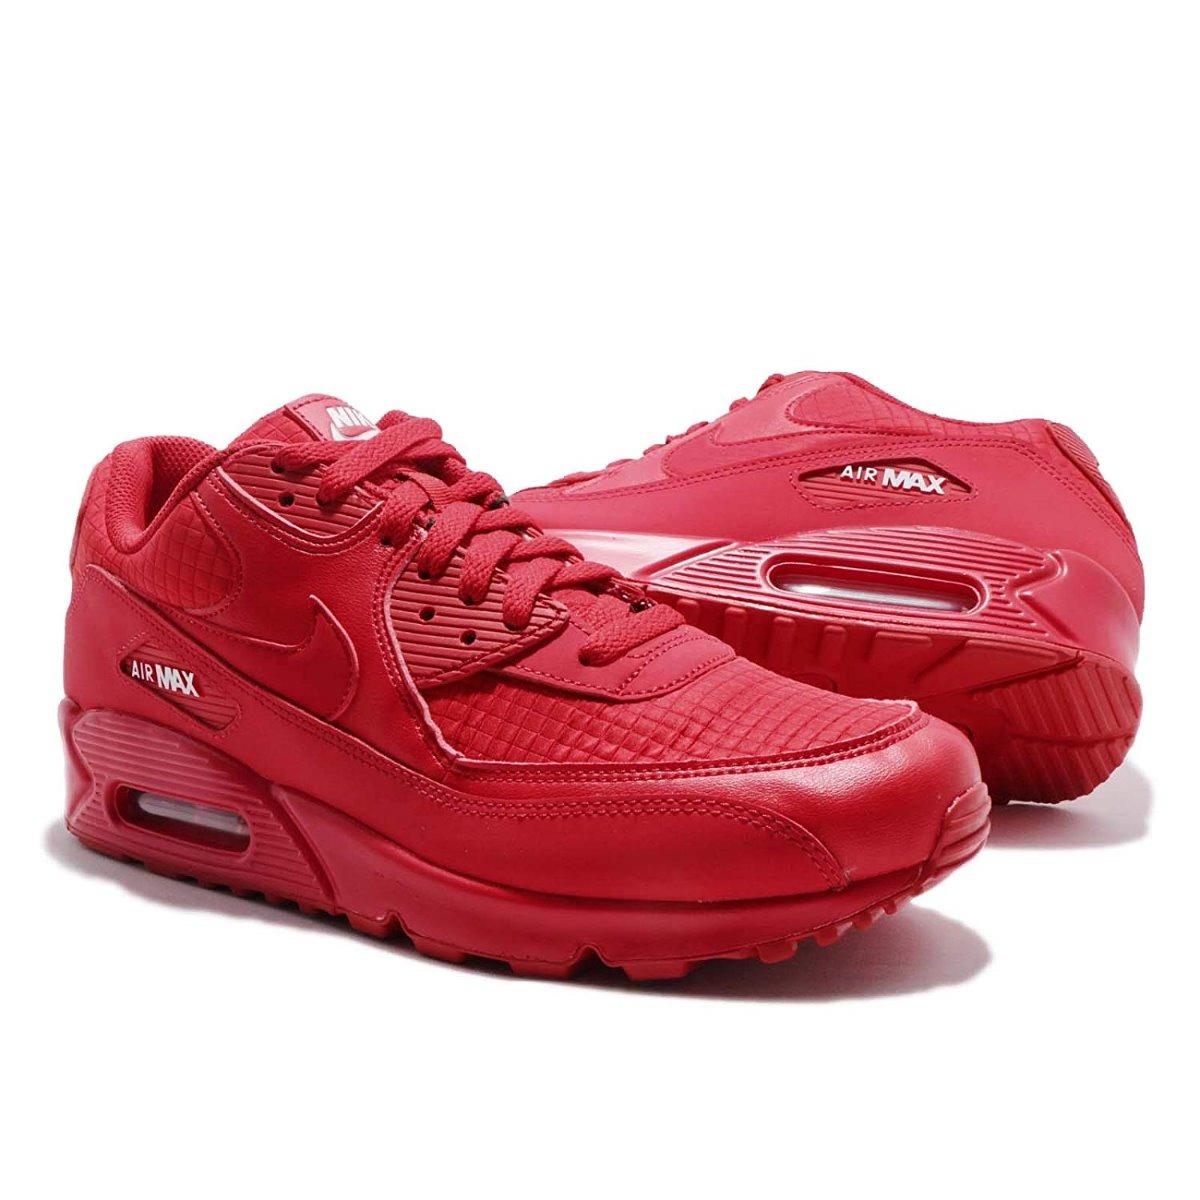 Tenis Nike Air Max 90 Essential Rojo #8.5 Mx Originales